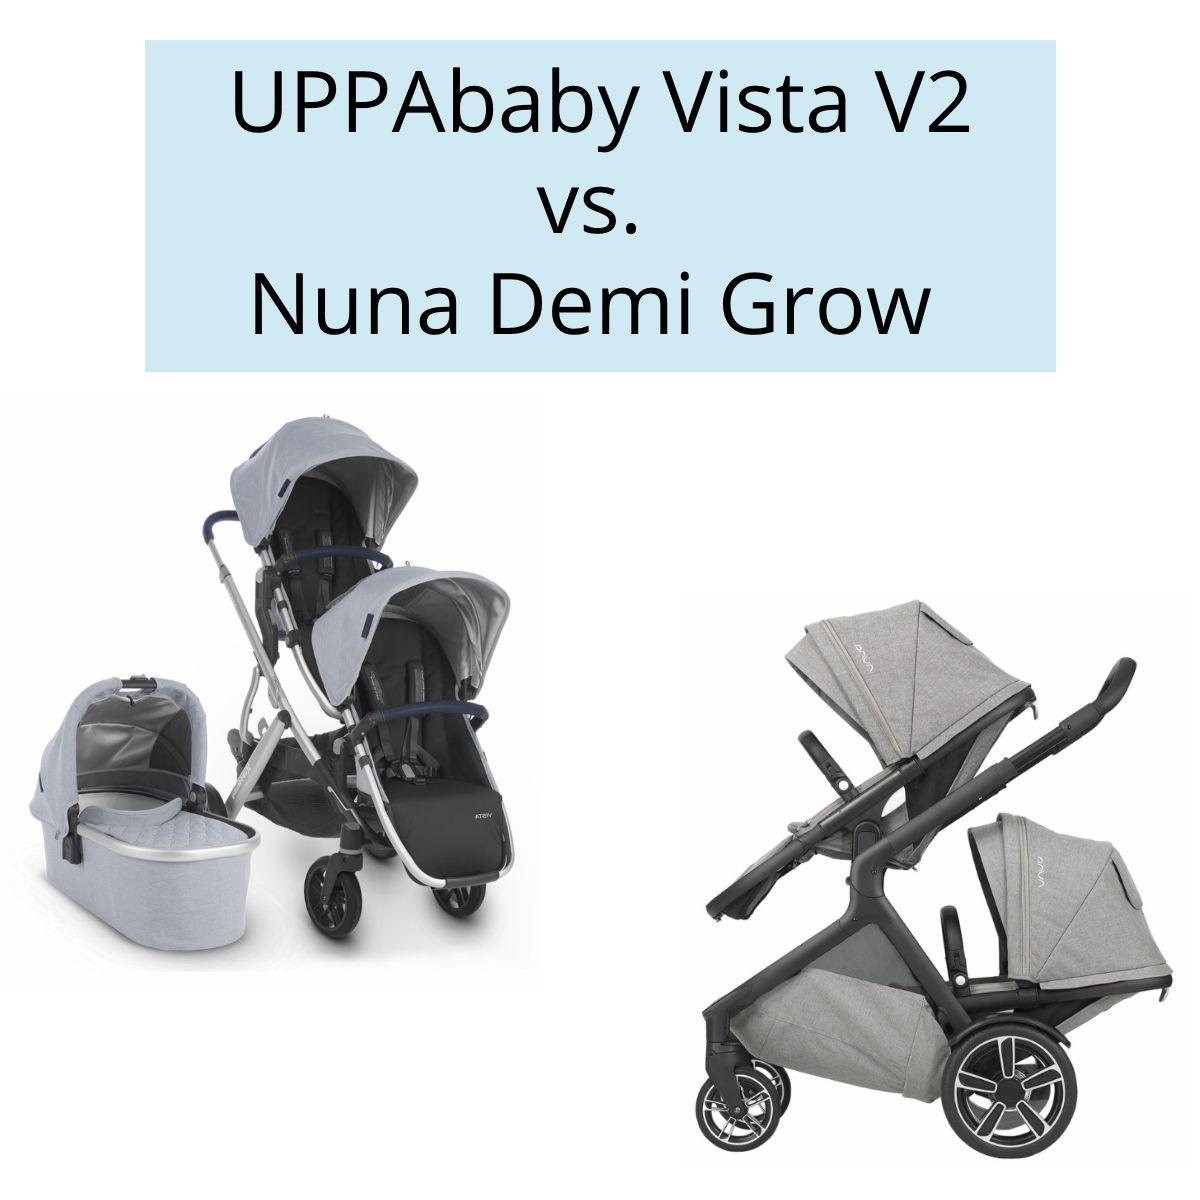 Here's a full stroller comparison of the Vista V2 vs. Demi